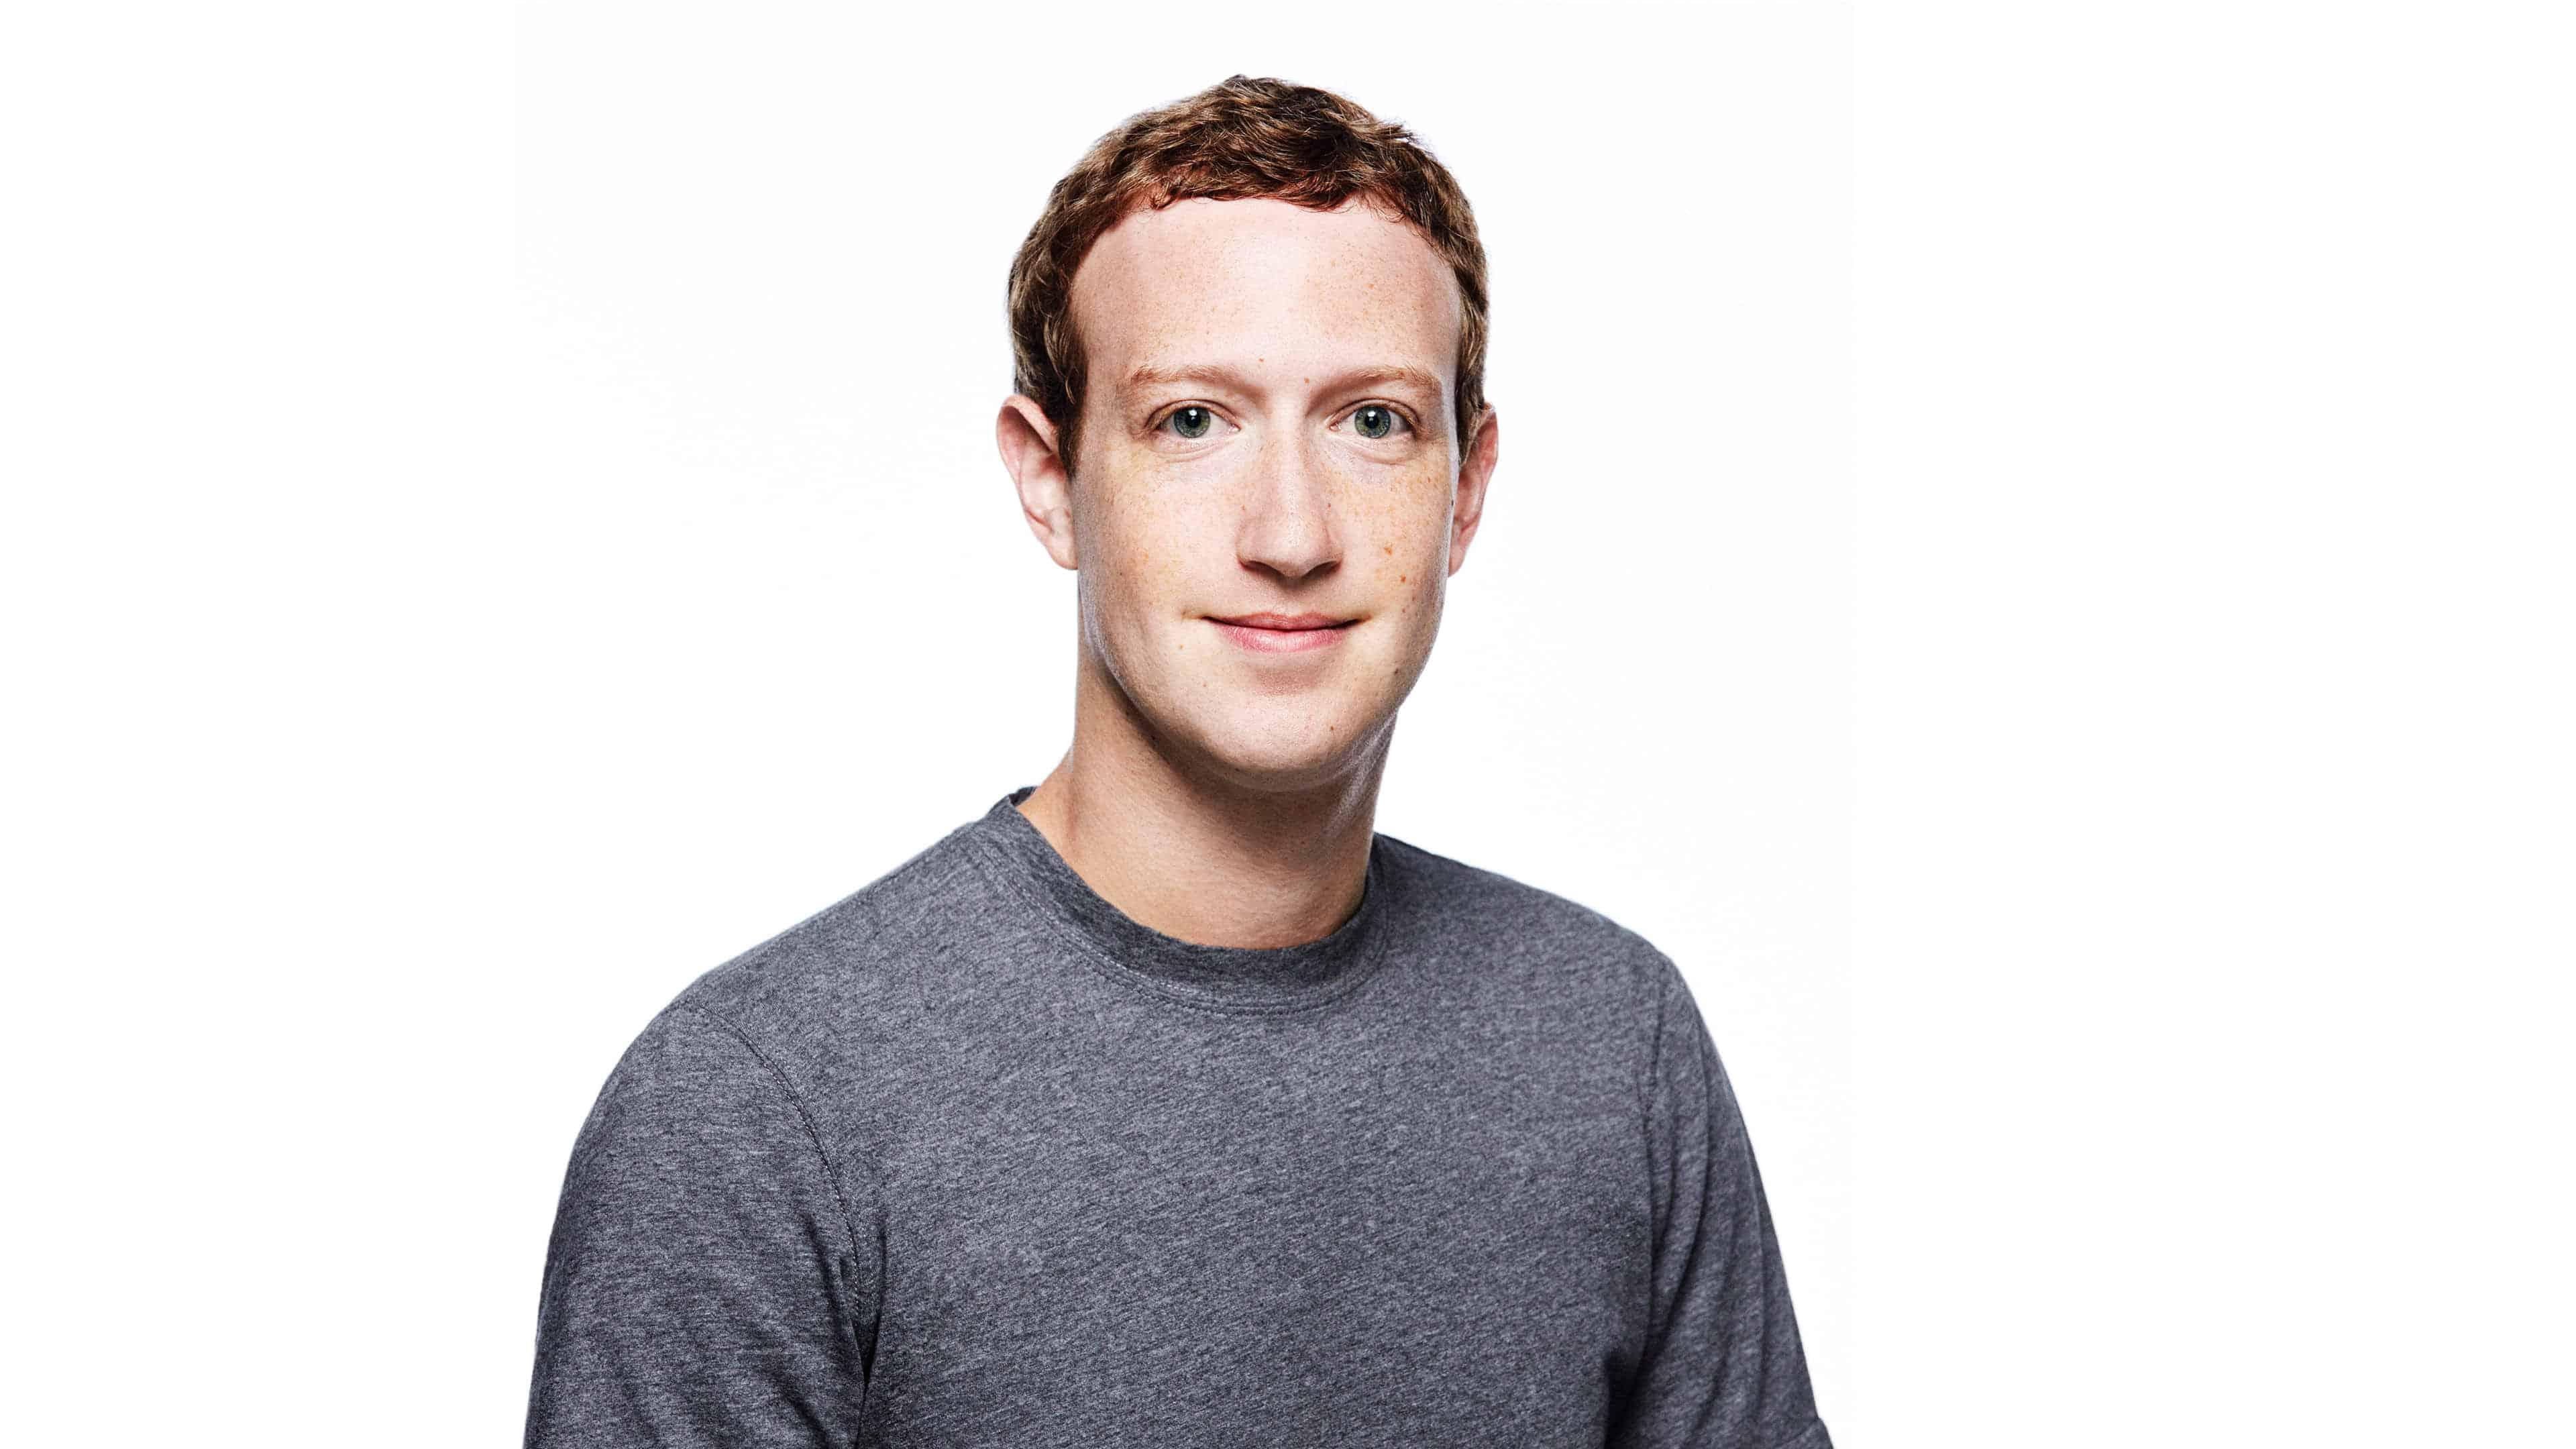 Mark Zuckerberg Facebook UHD 4K Wallpaper Pixelz 3840x2160